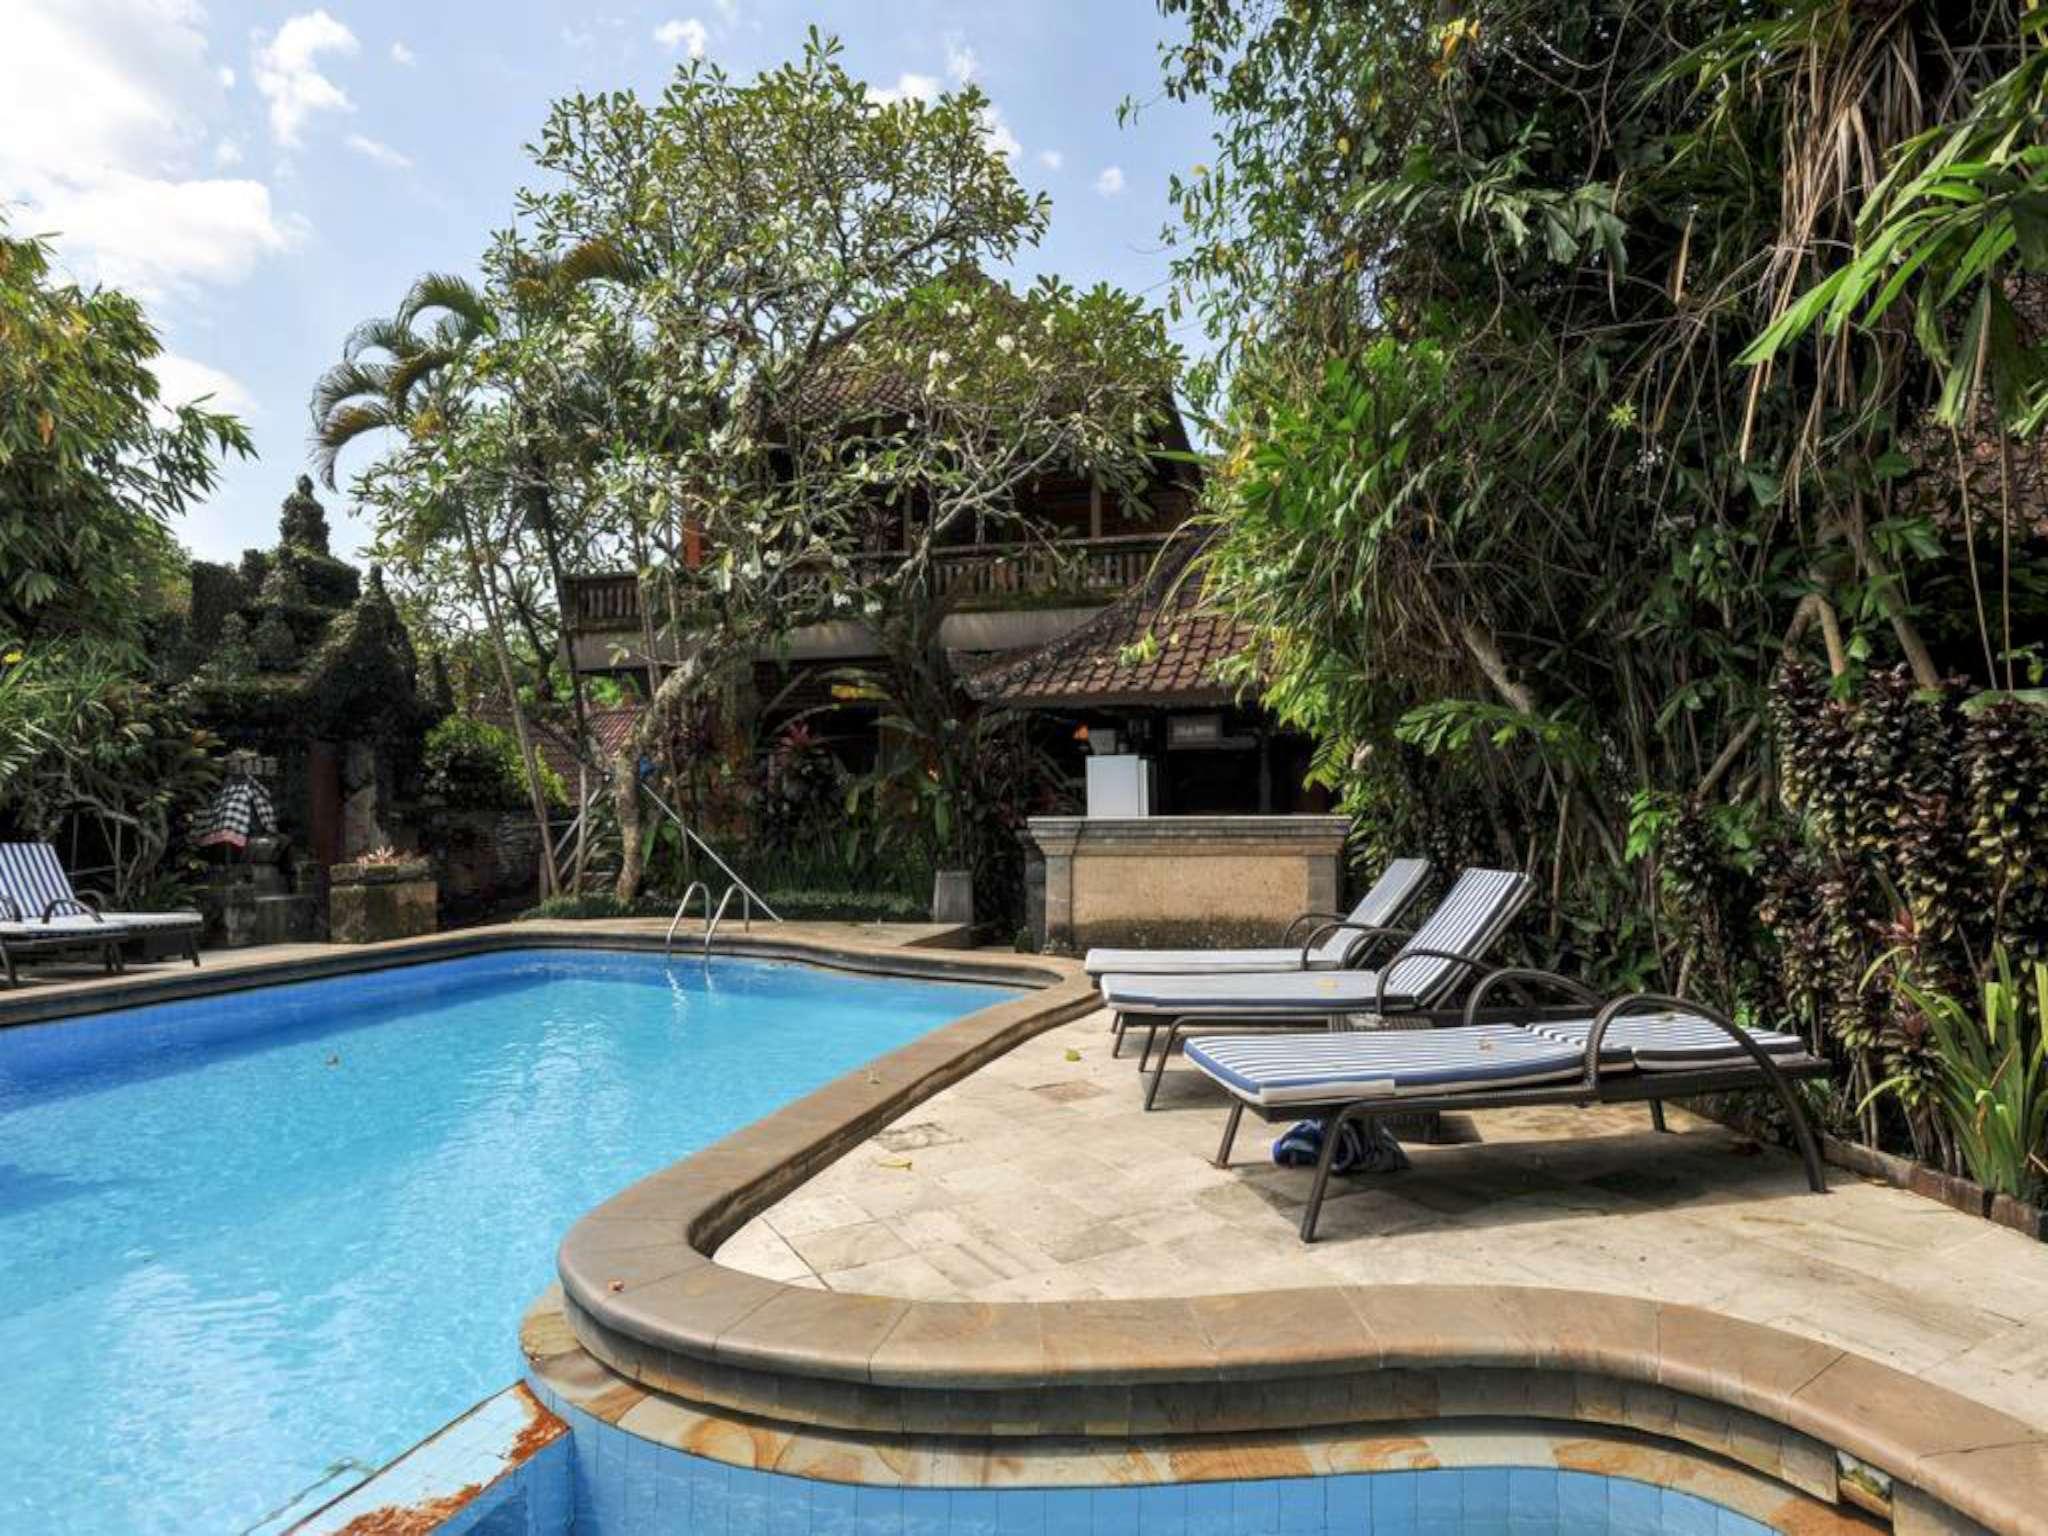 Absolute Balinese Rooms At Ubud Palace